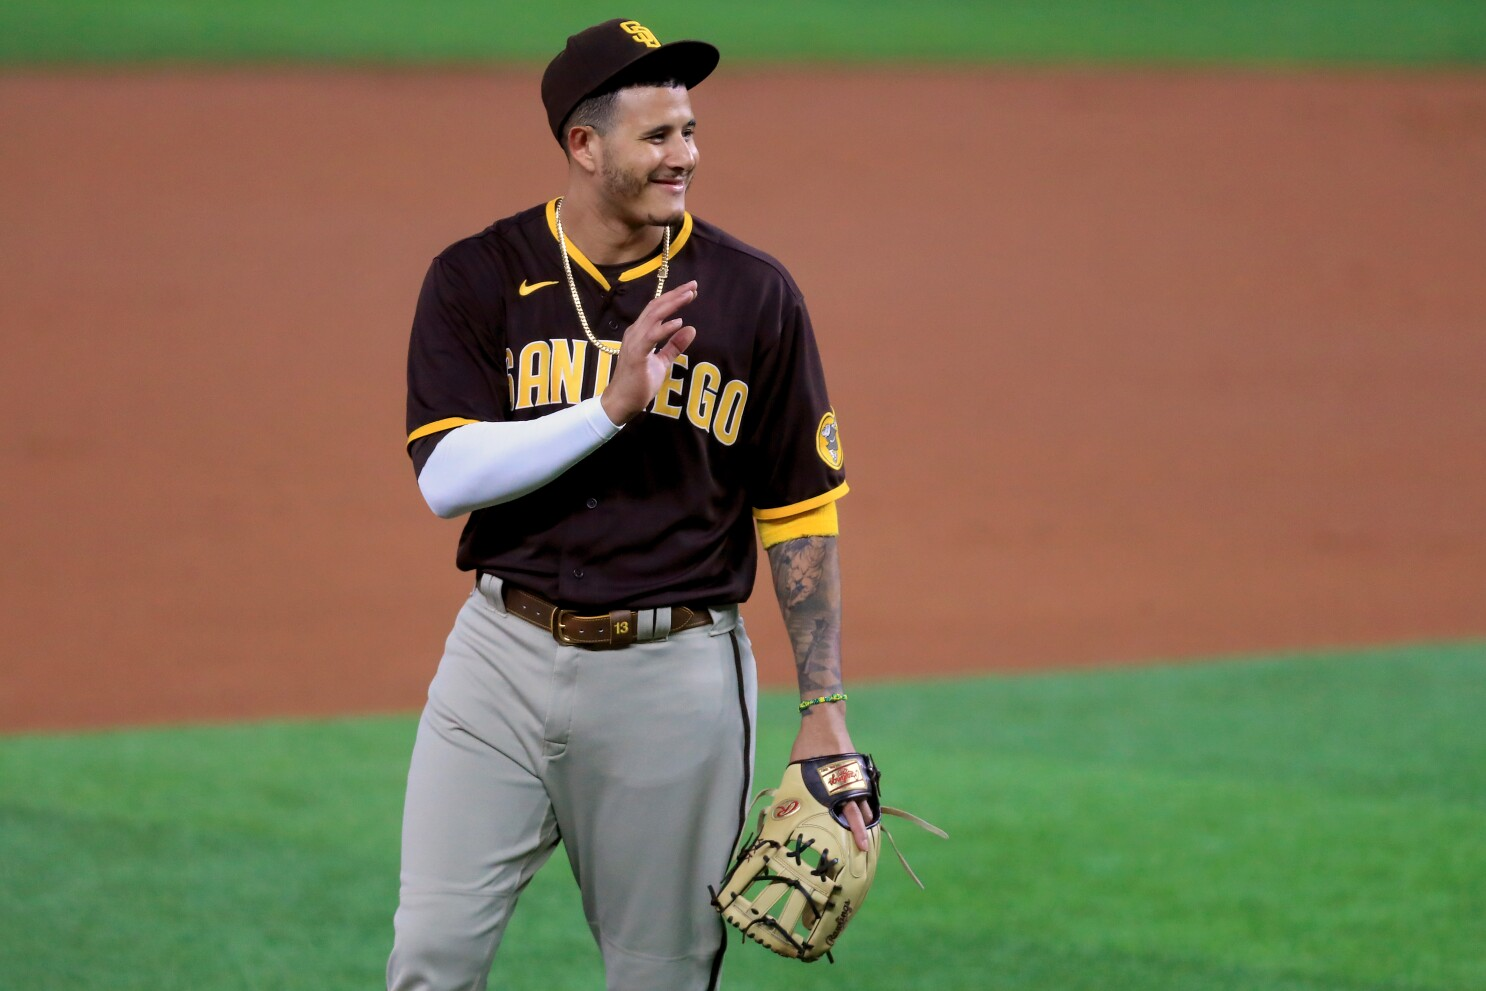 Padres notes: Manny Machado's catch; San Diego MLB bubble? - The San Diego Union-Tribune